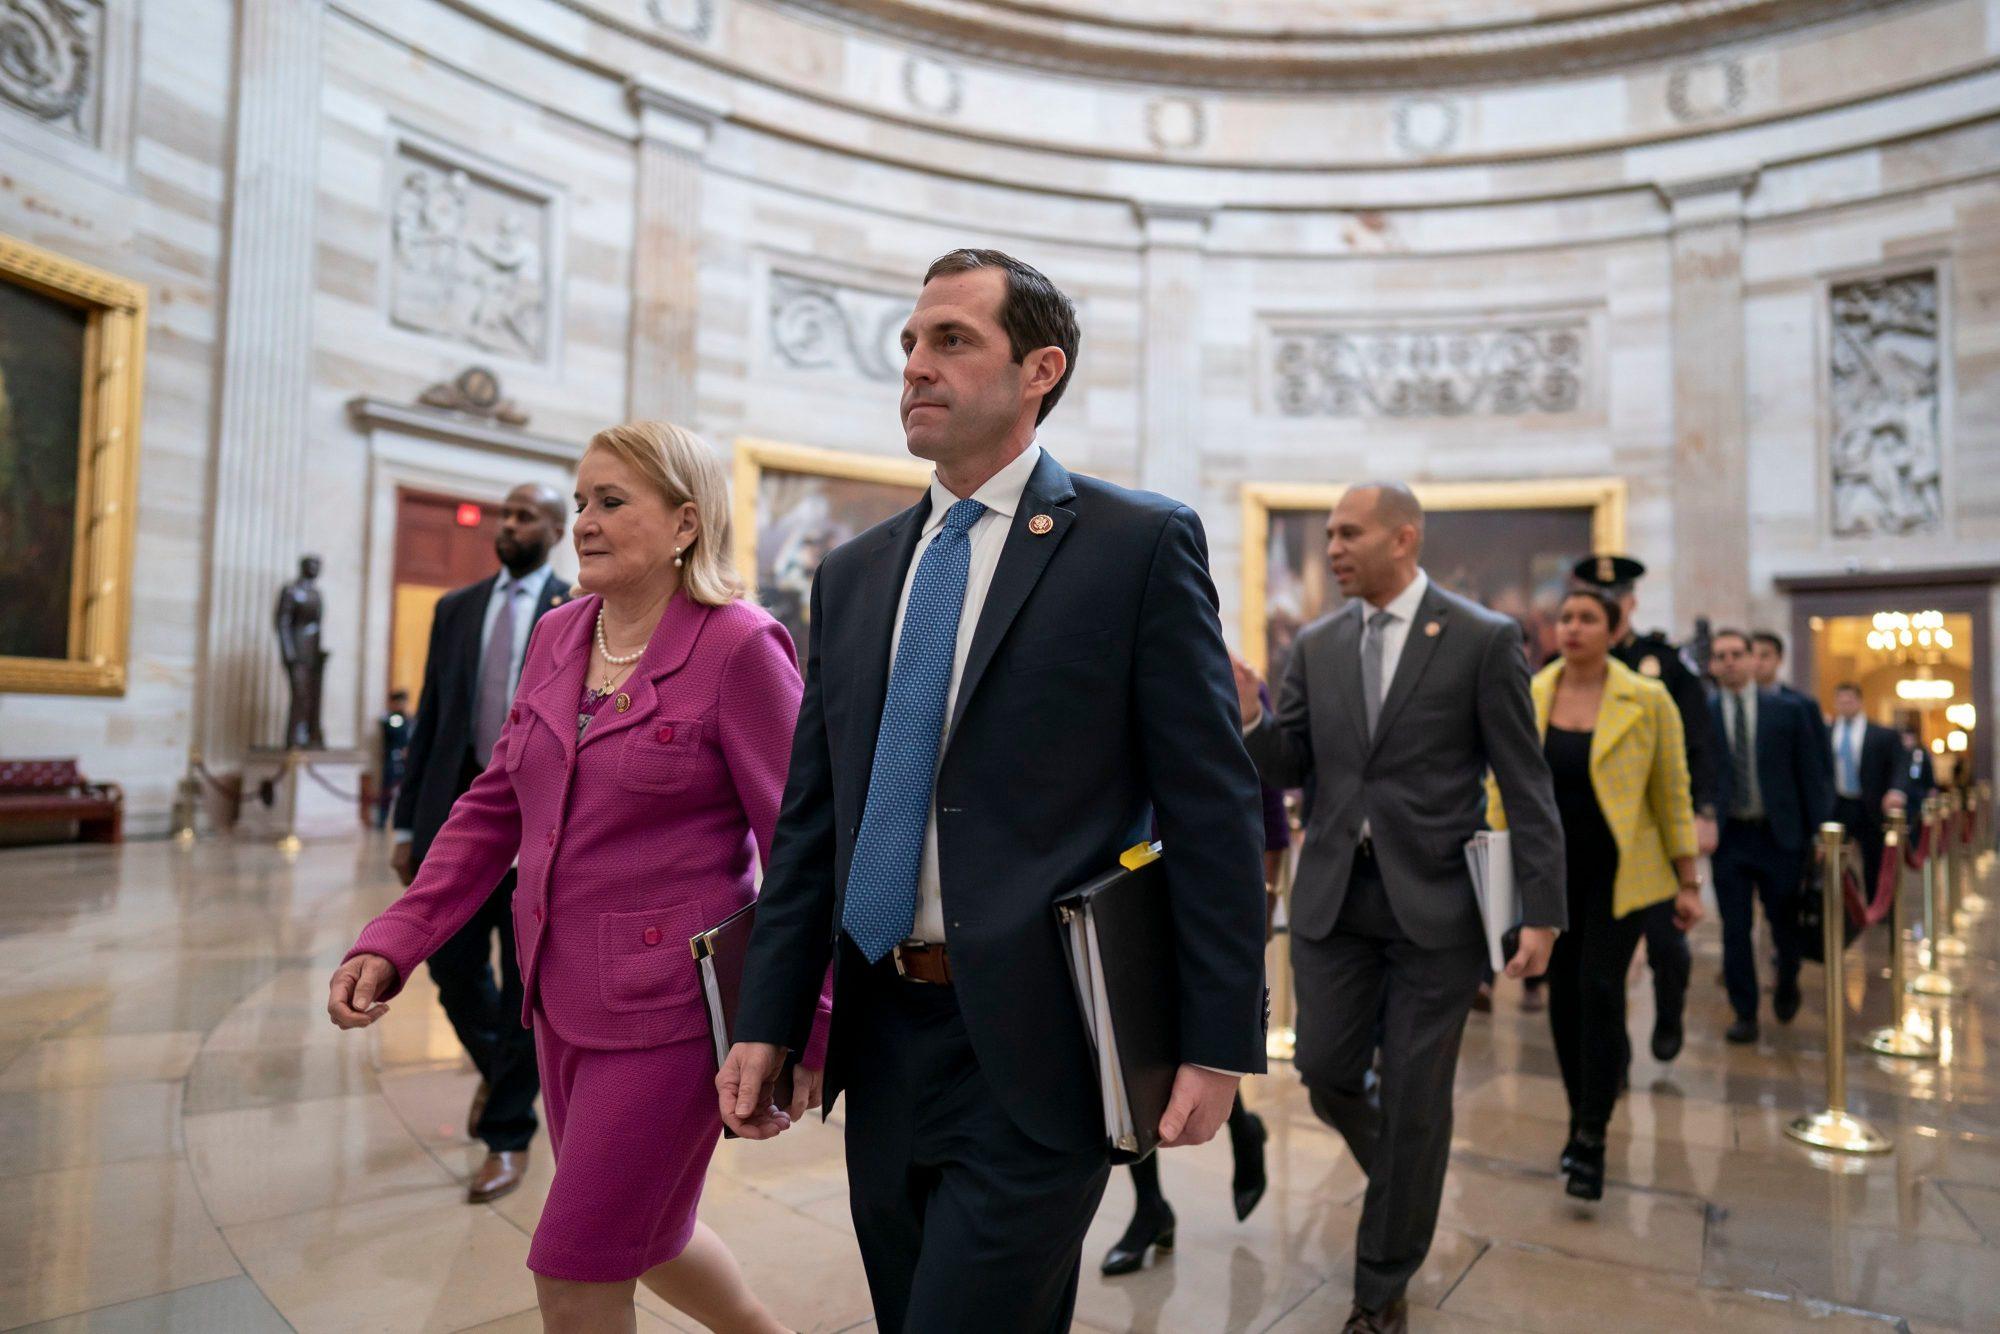 Can a Freshman Congressman Prosecute Trump for High Crimes -- and Still Keep His Faith in Humanity?